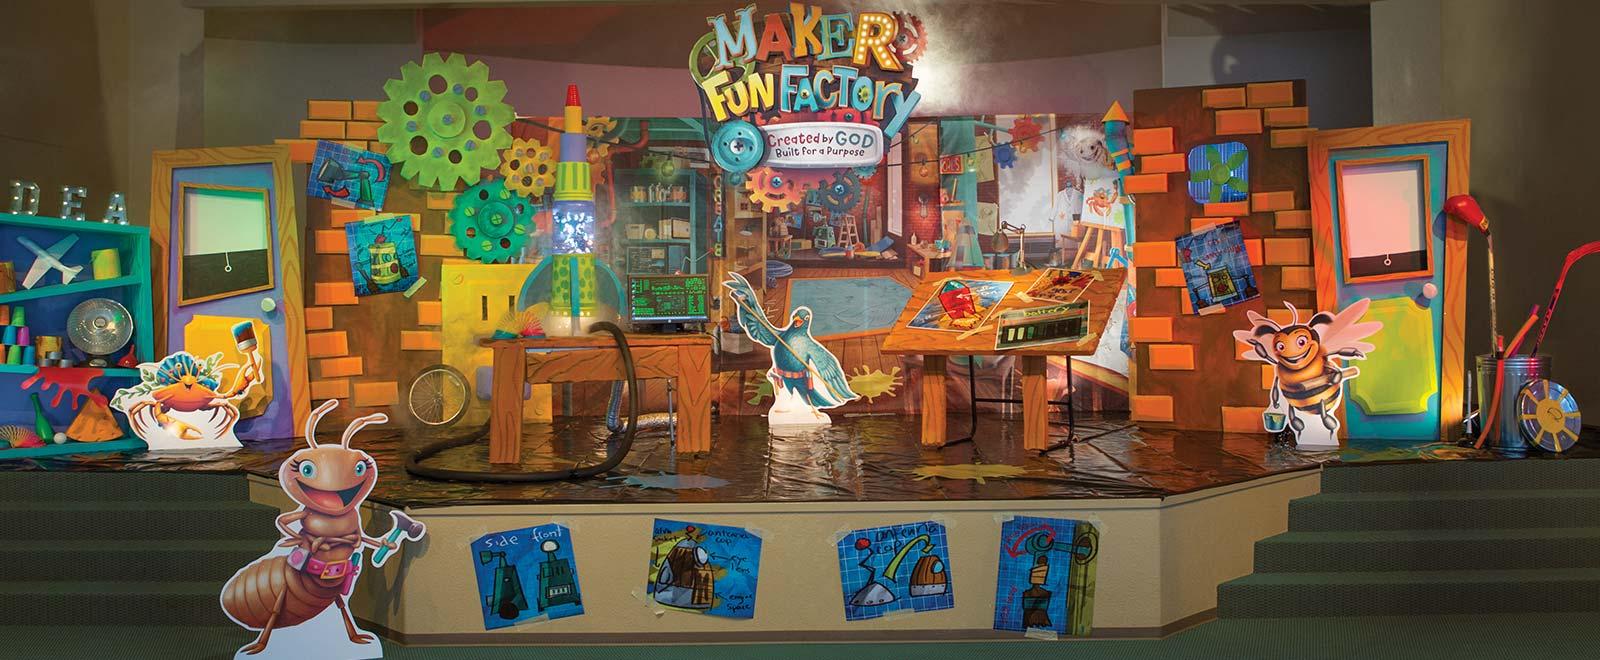 Maker Fun Factory.